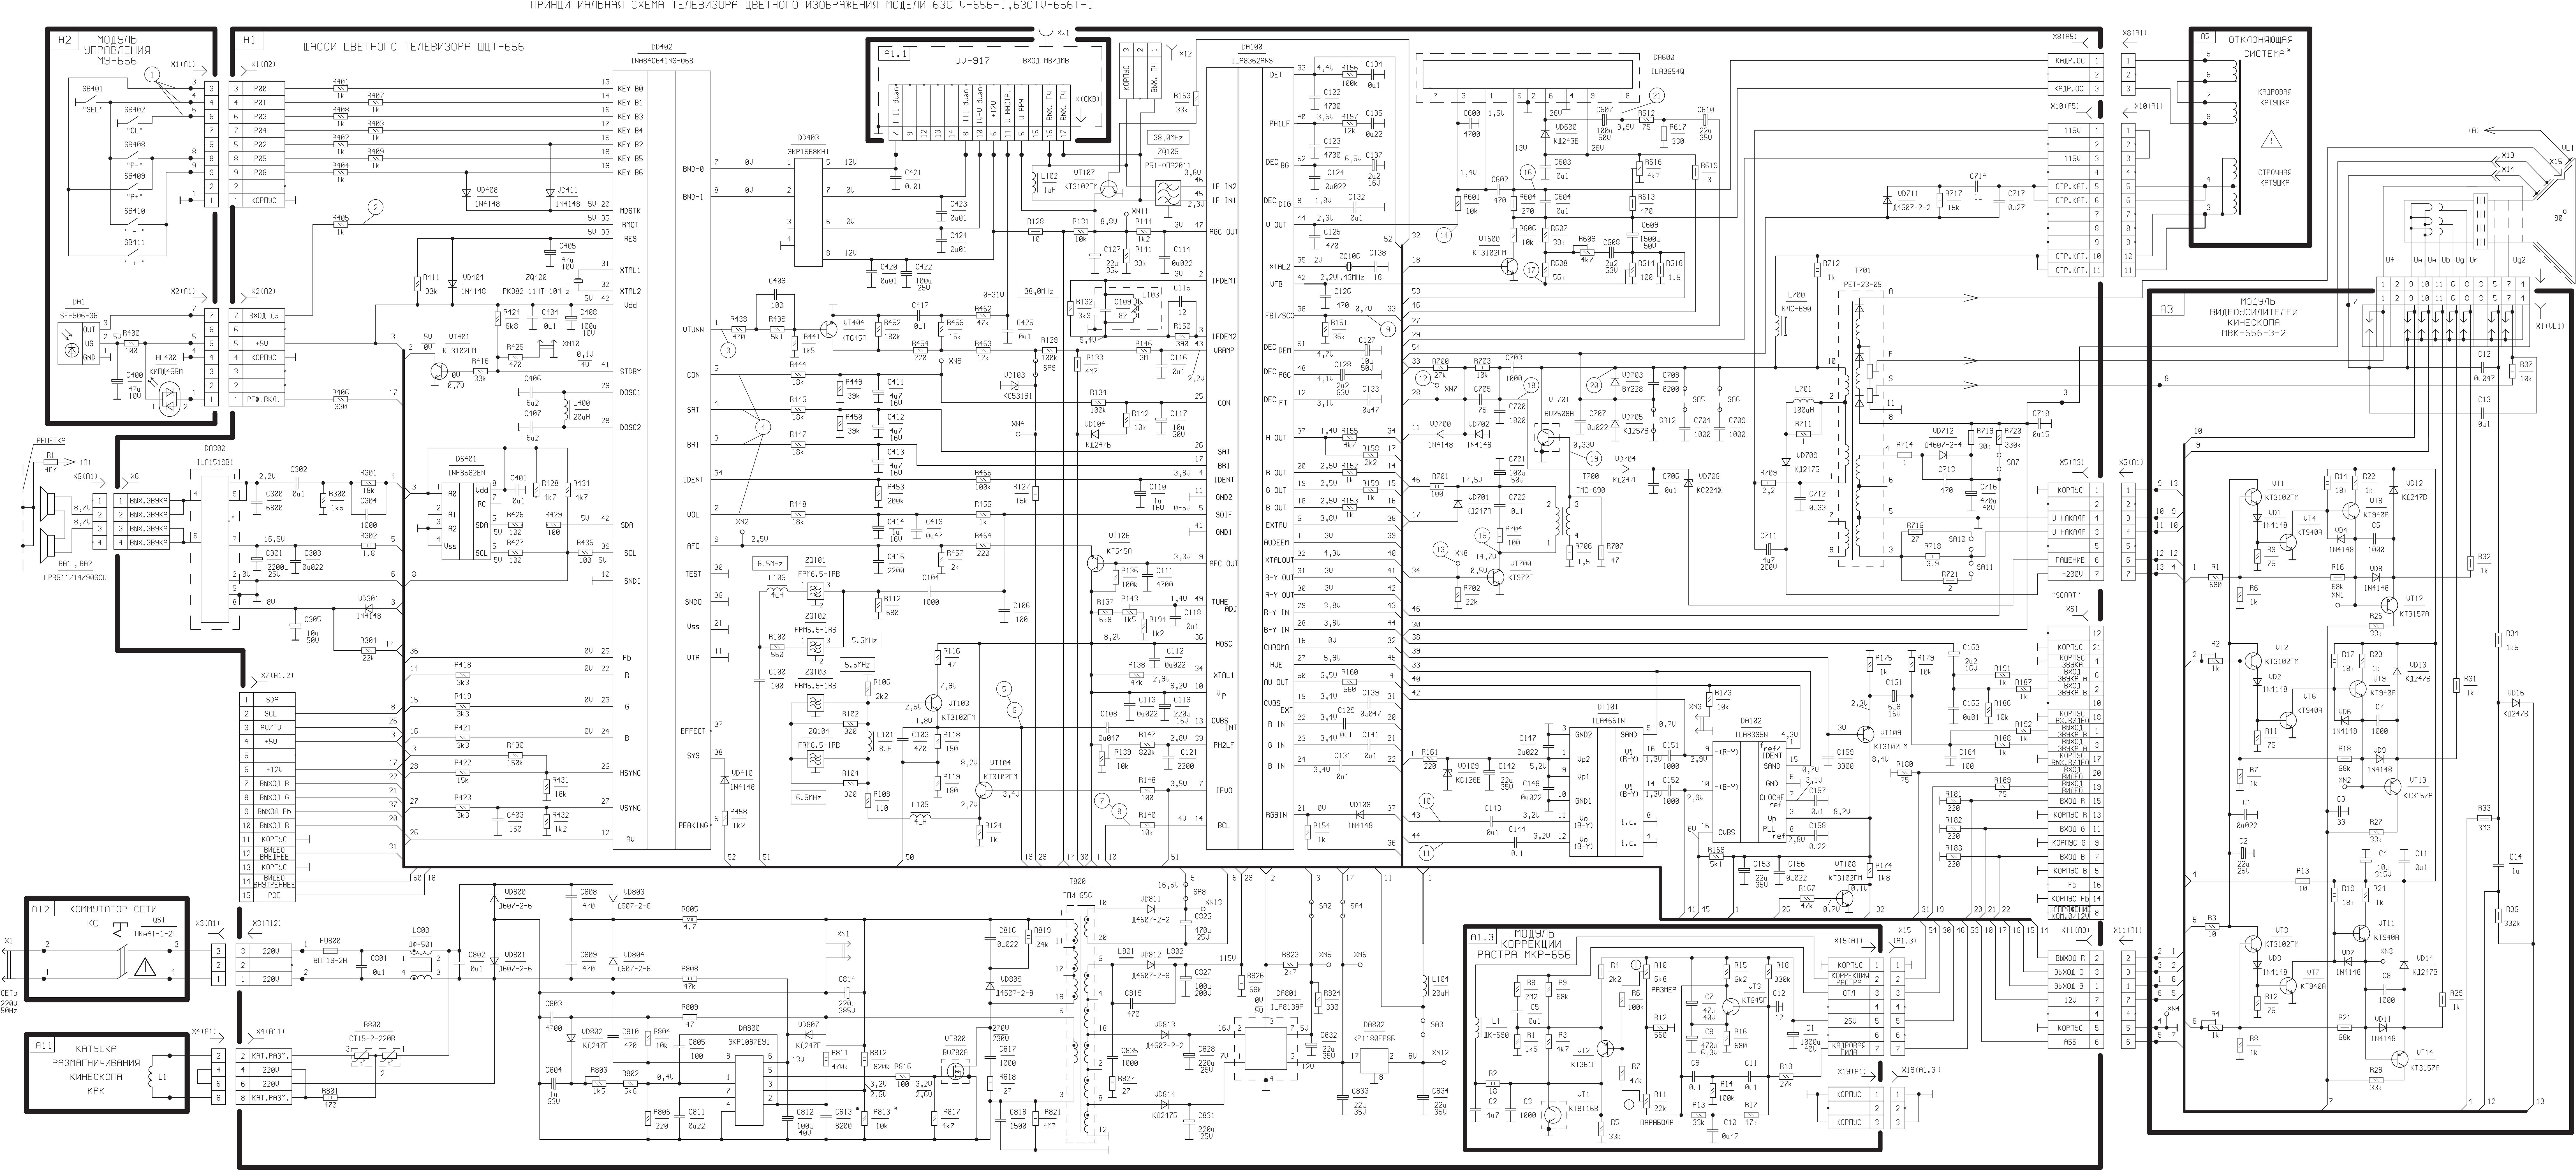 Nash ctv-n1495 схема